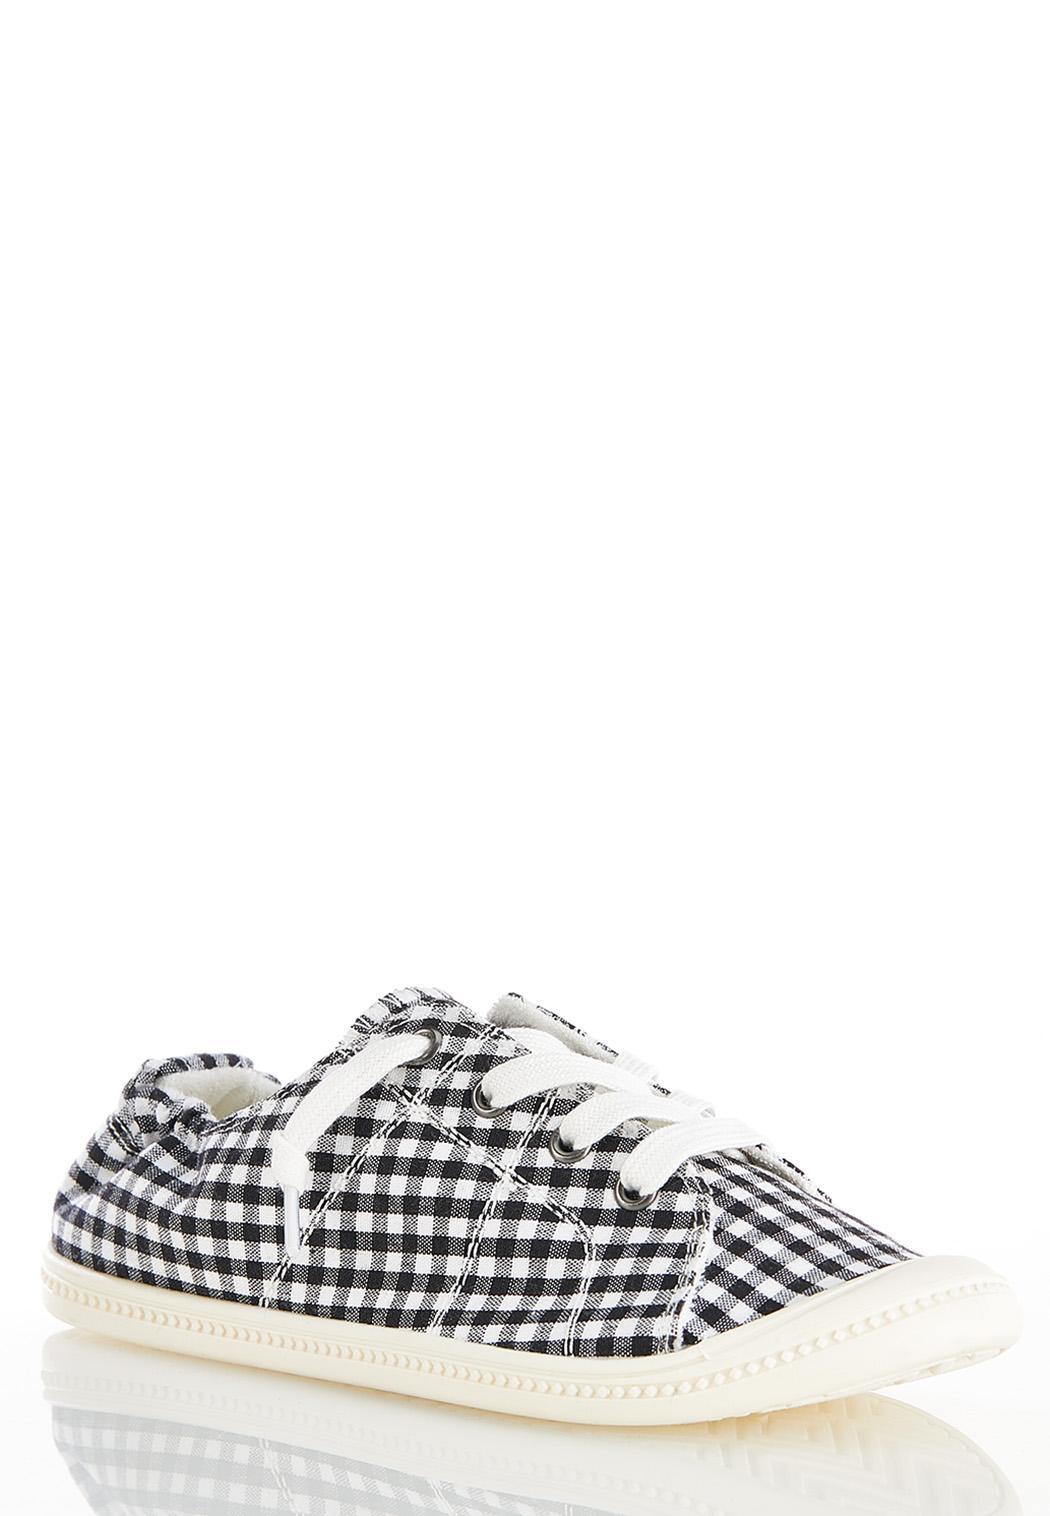 Gingham Scrunch Sneakers